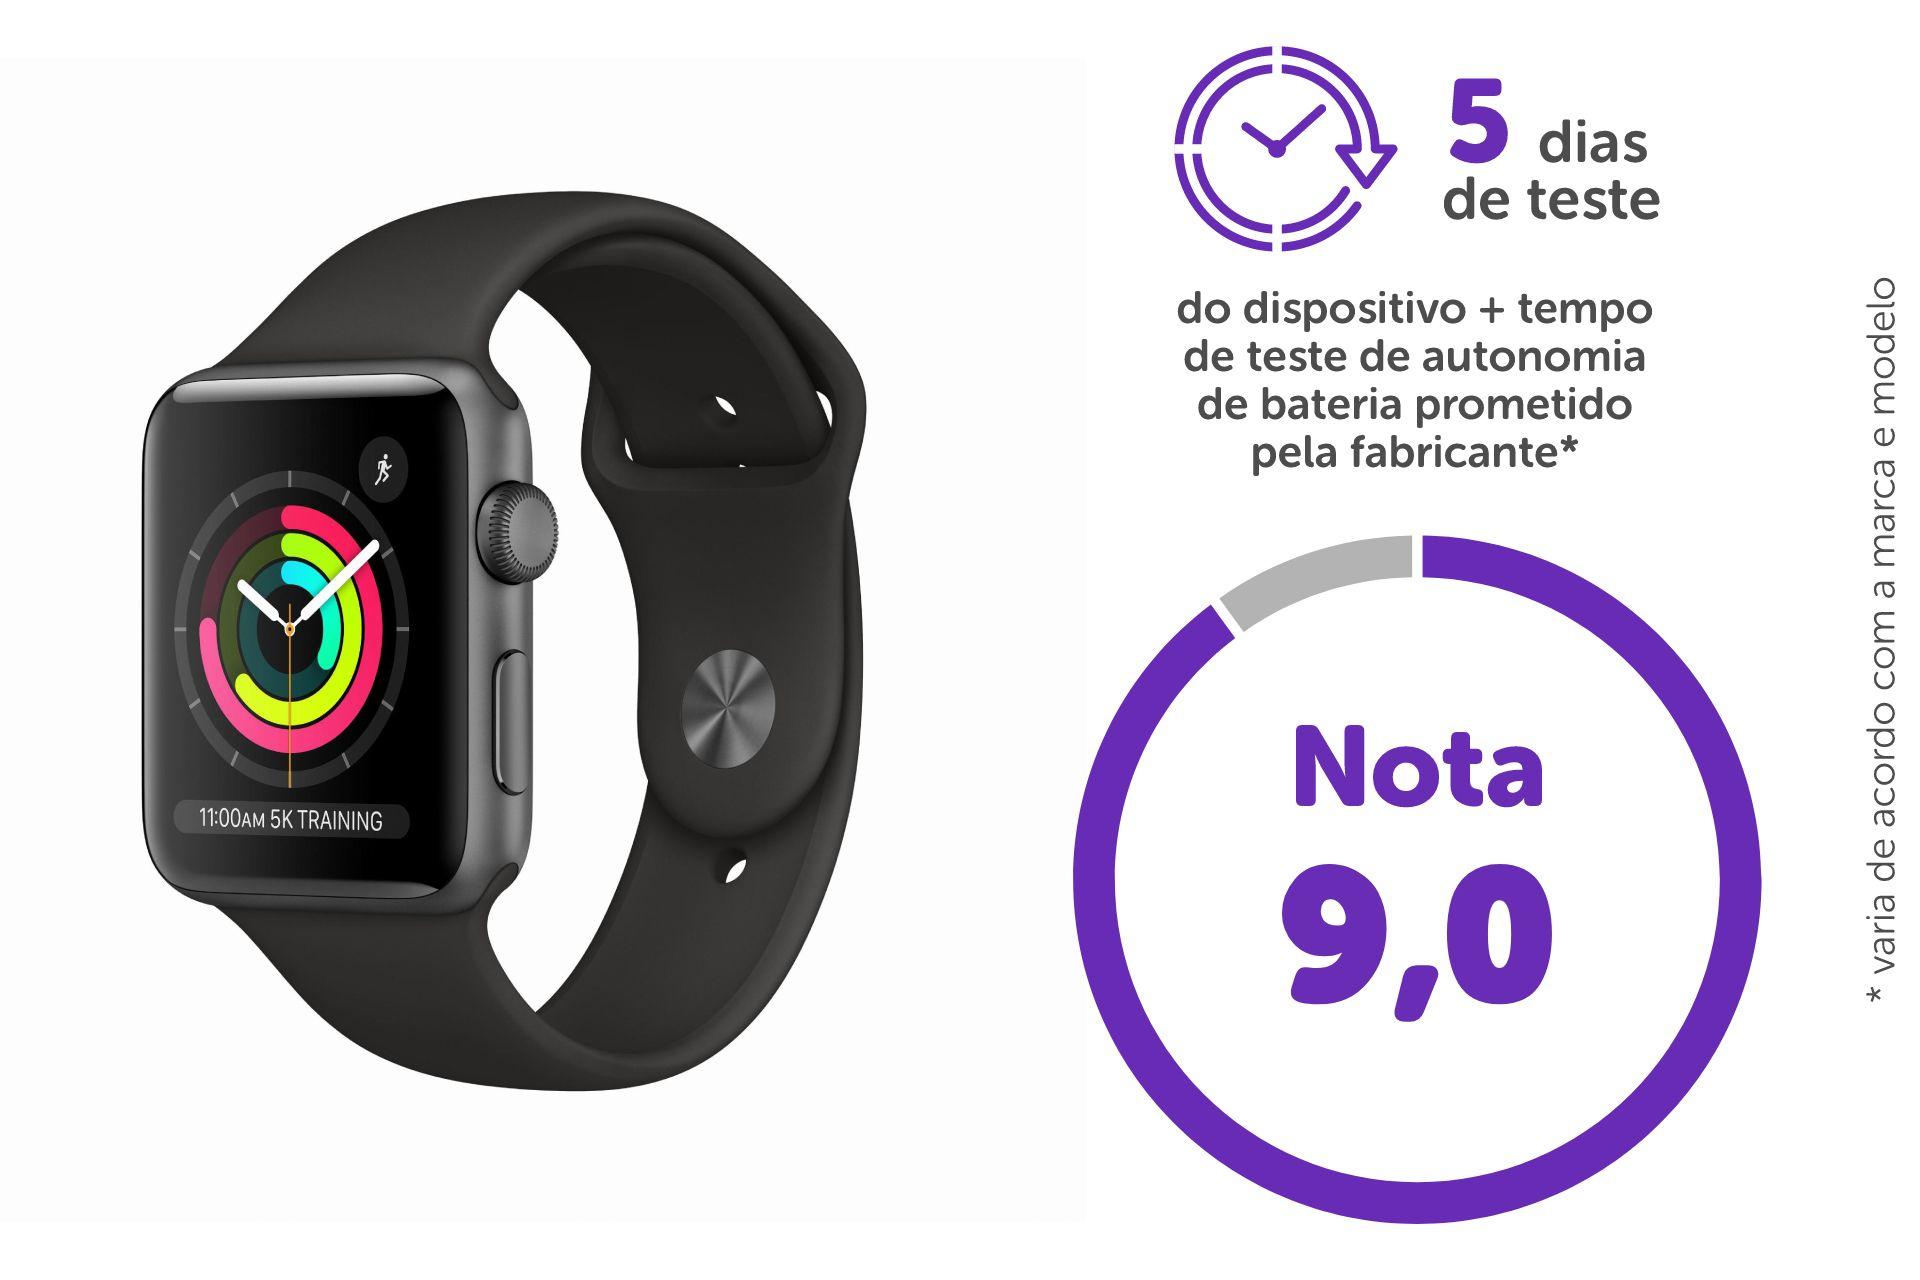 Nota do Apple Watch 3 é 9